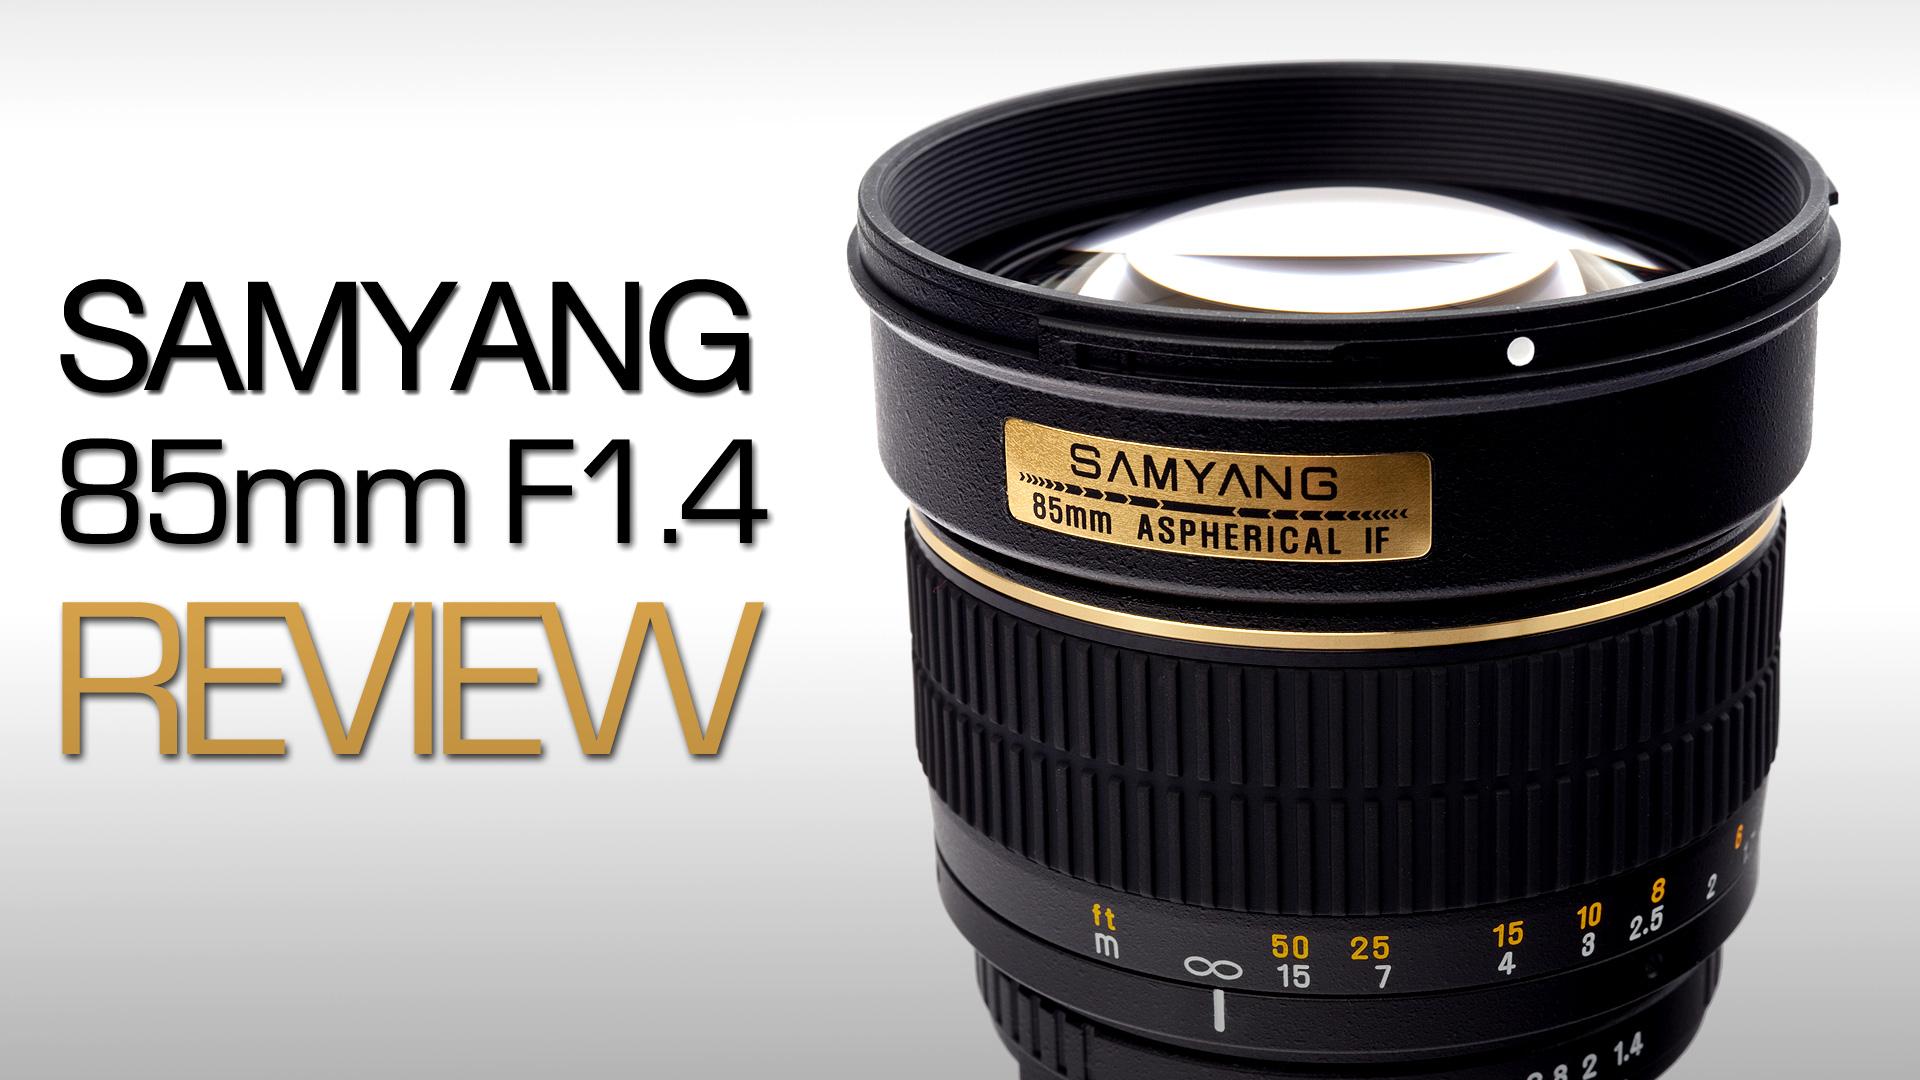 Samyang 85mm F1.4 REVIEW